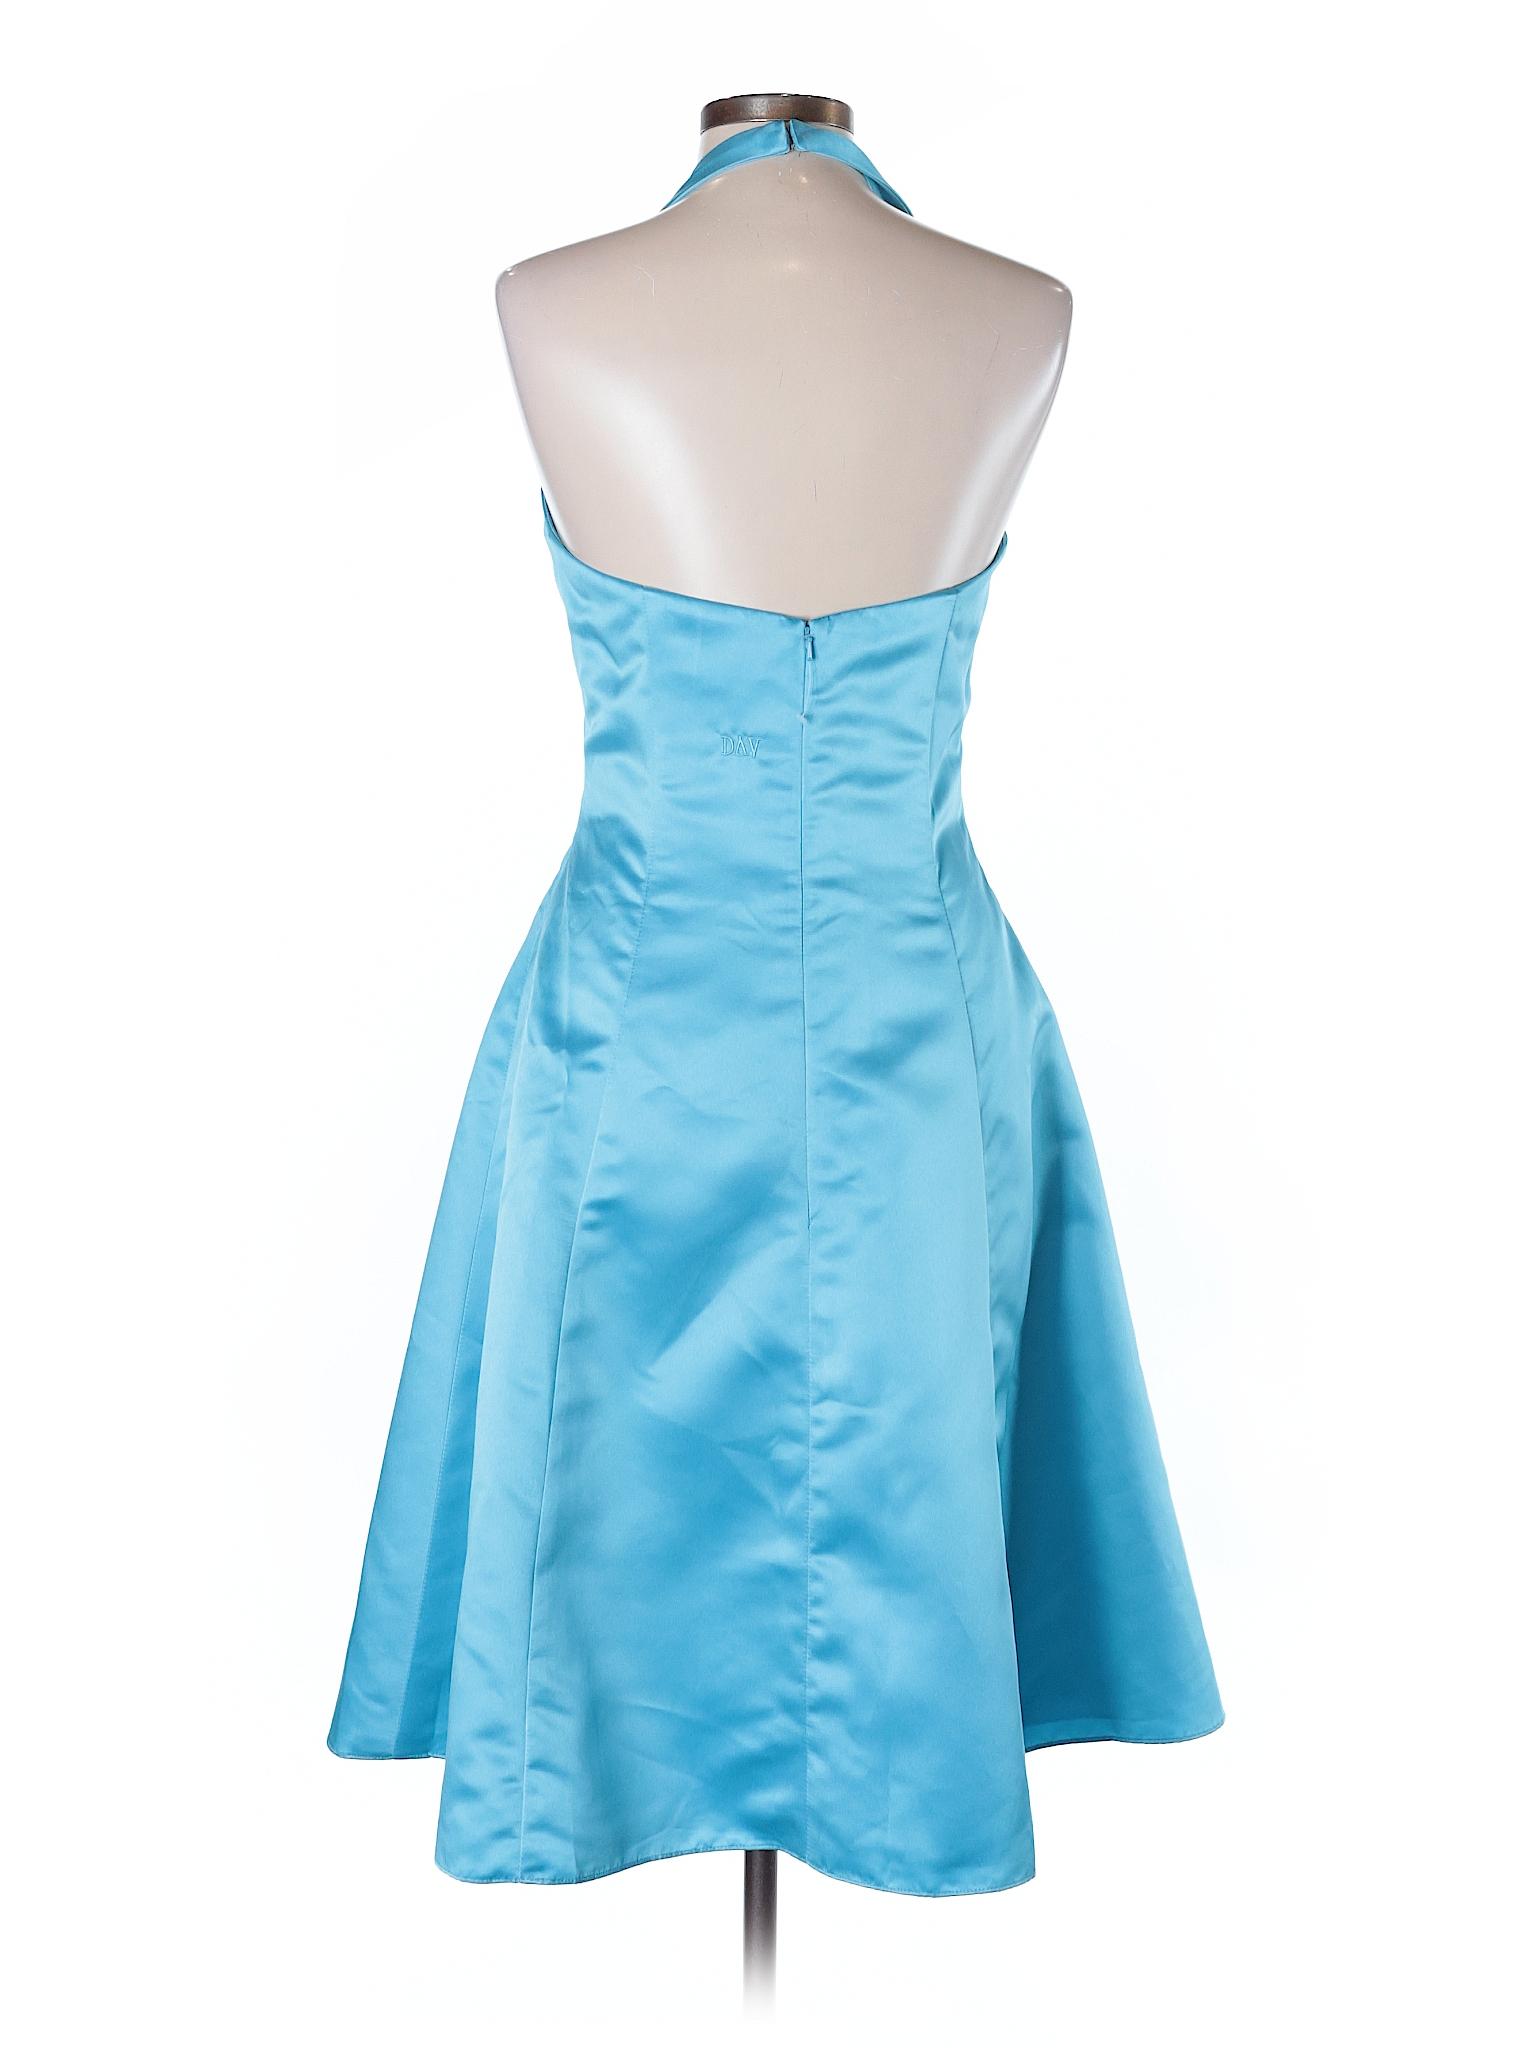 Boutique winter Casual Da Vinci Dress BAxqBrwF1